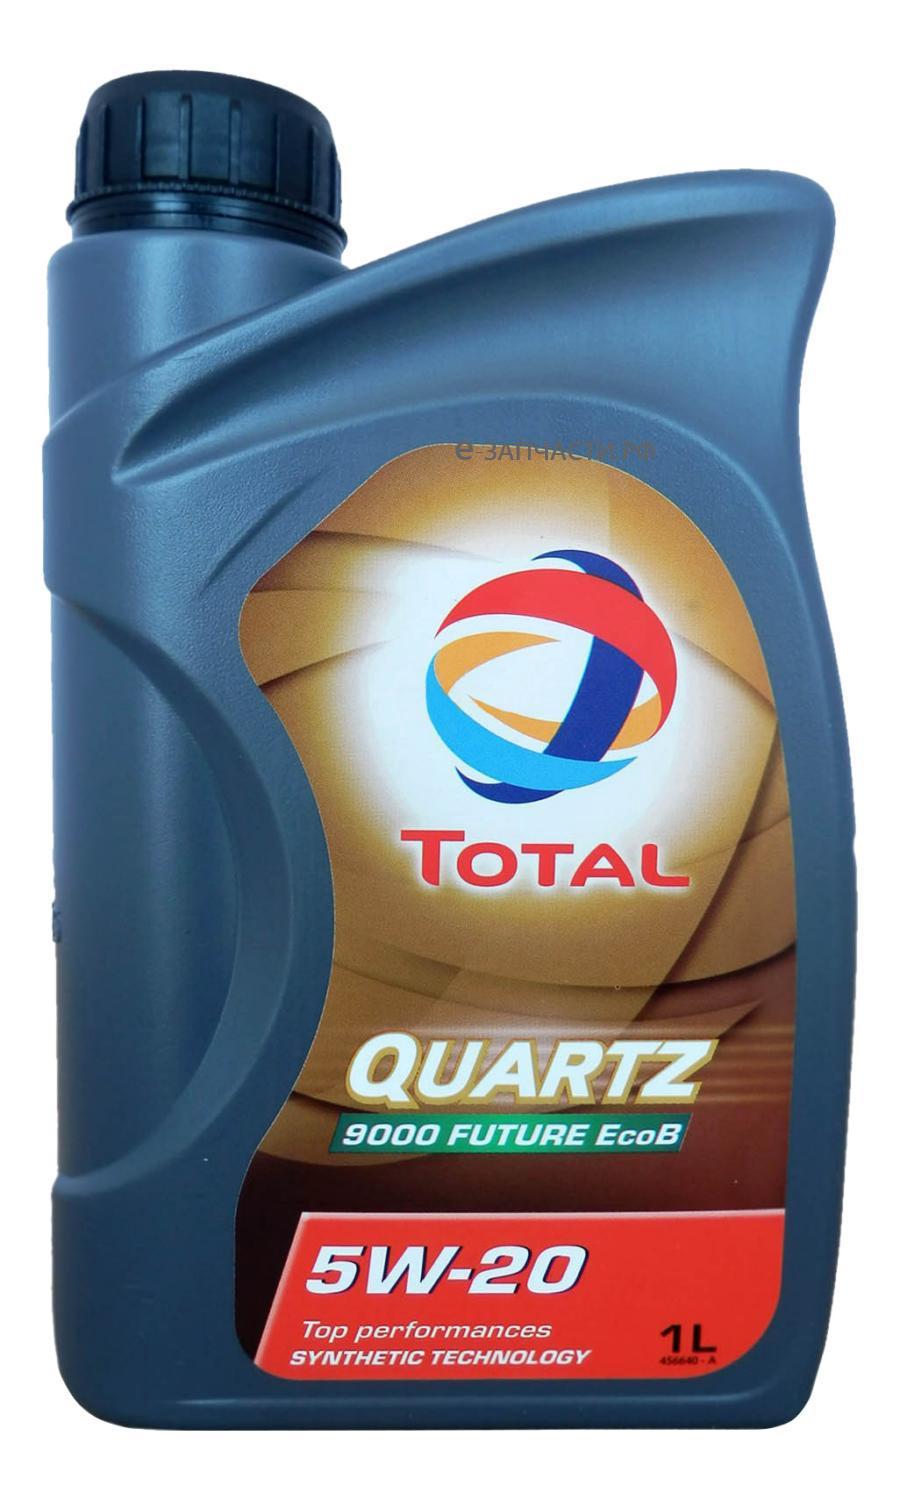 Масло моторное синтетическое Quartz 9000 Future EcoB 5W-20, 1л